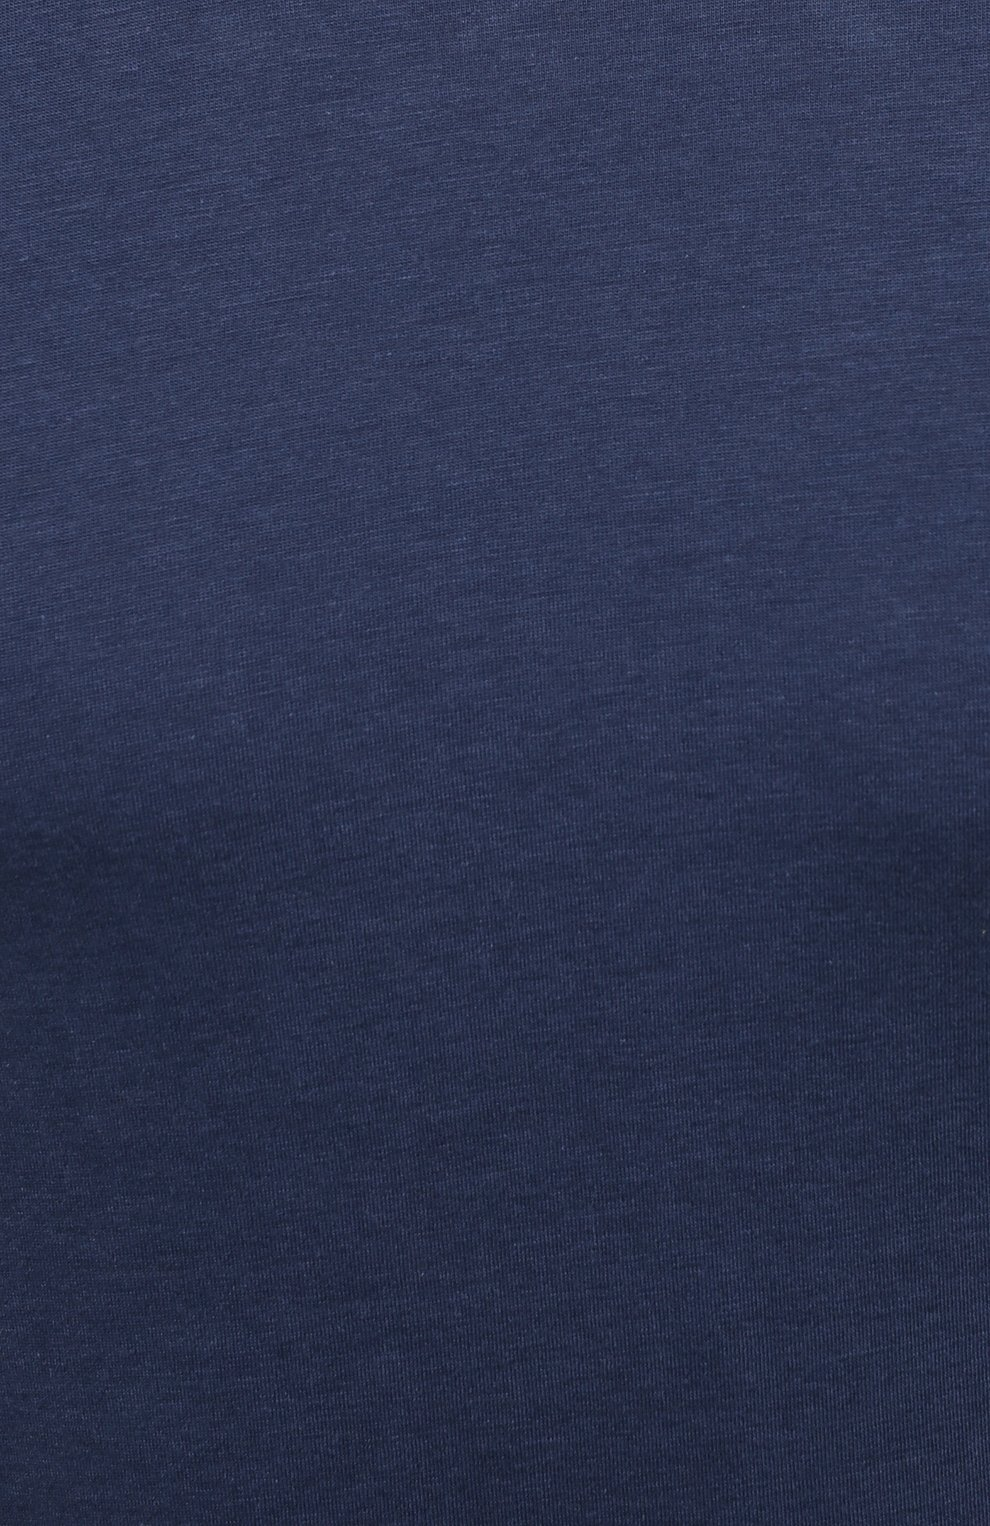 Мужская лонгслив TOM FORD темно-синего цвета, арт. BW229/TFJ972   Фото 5